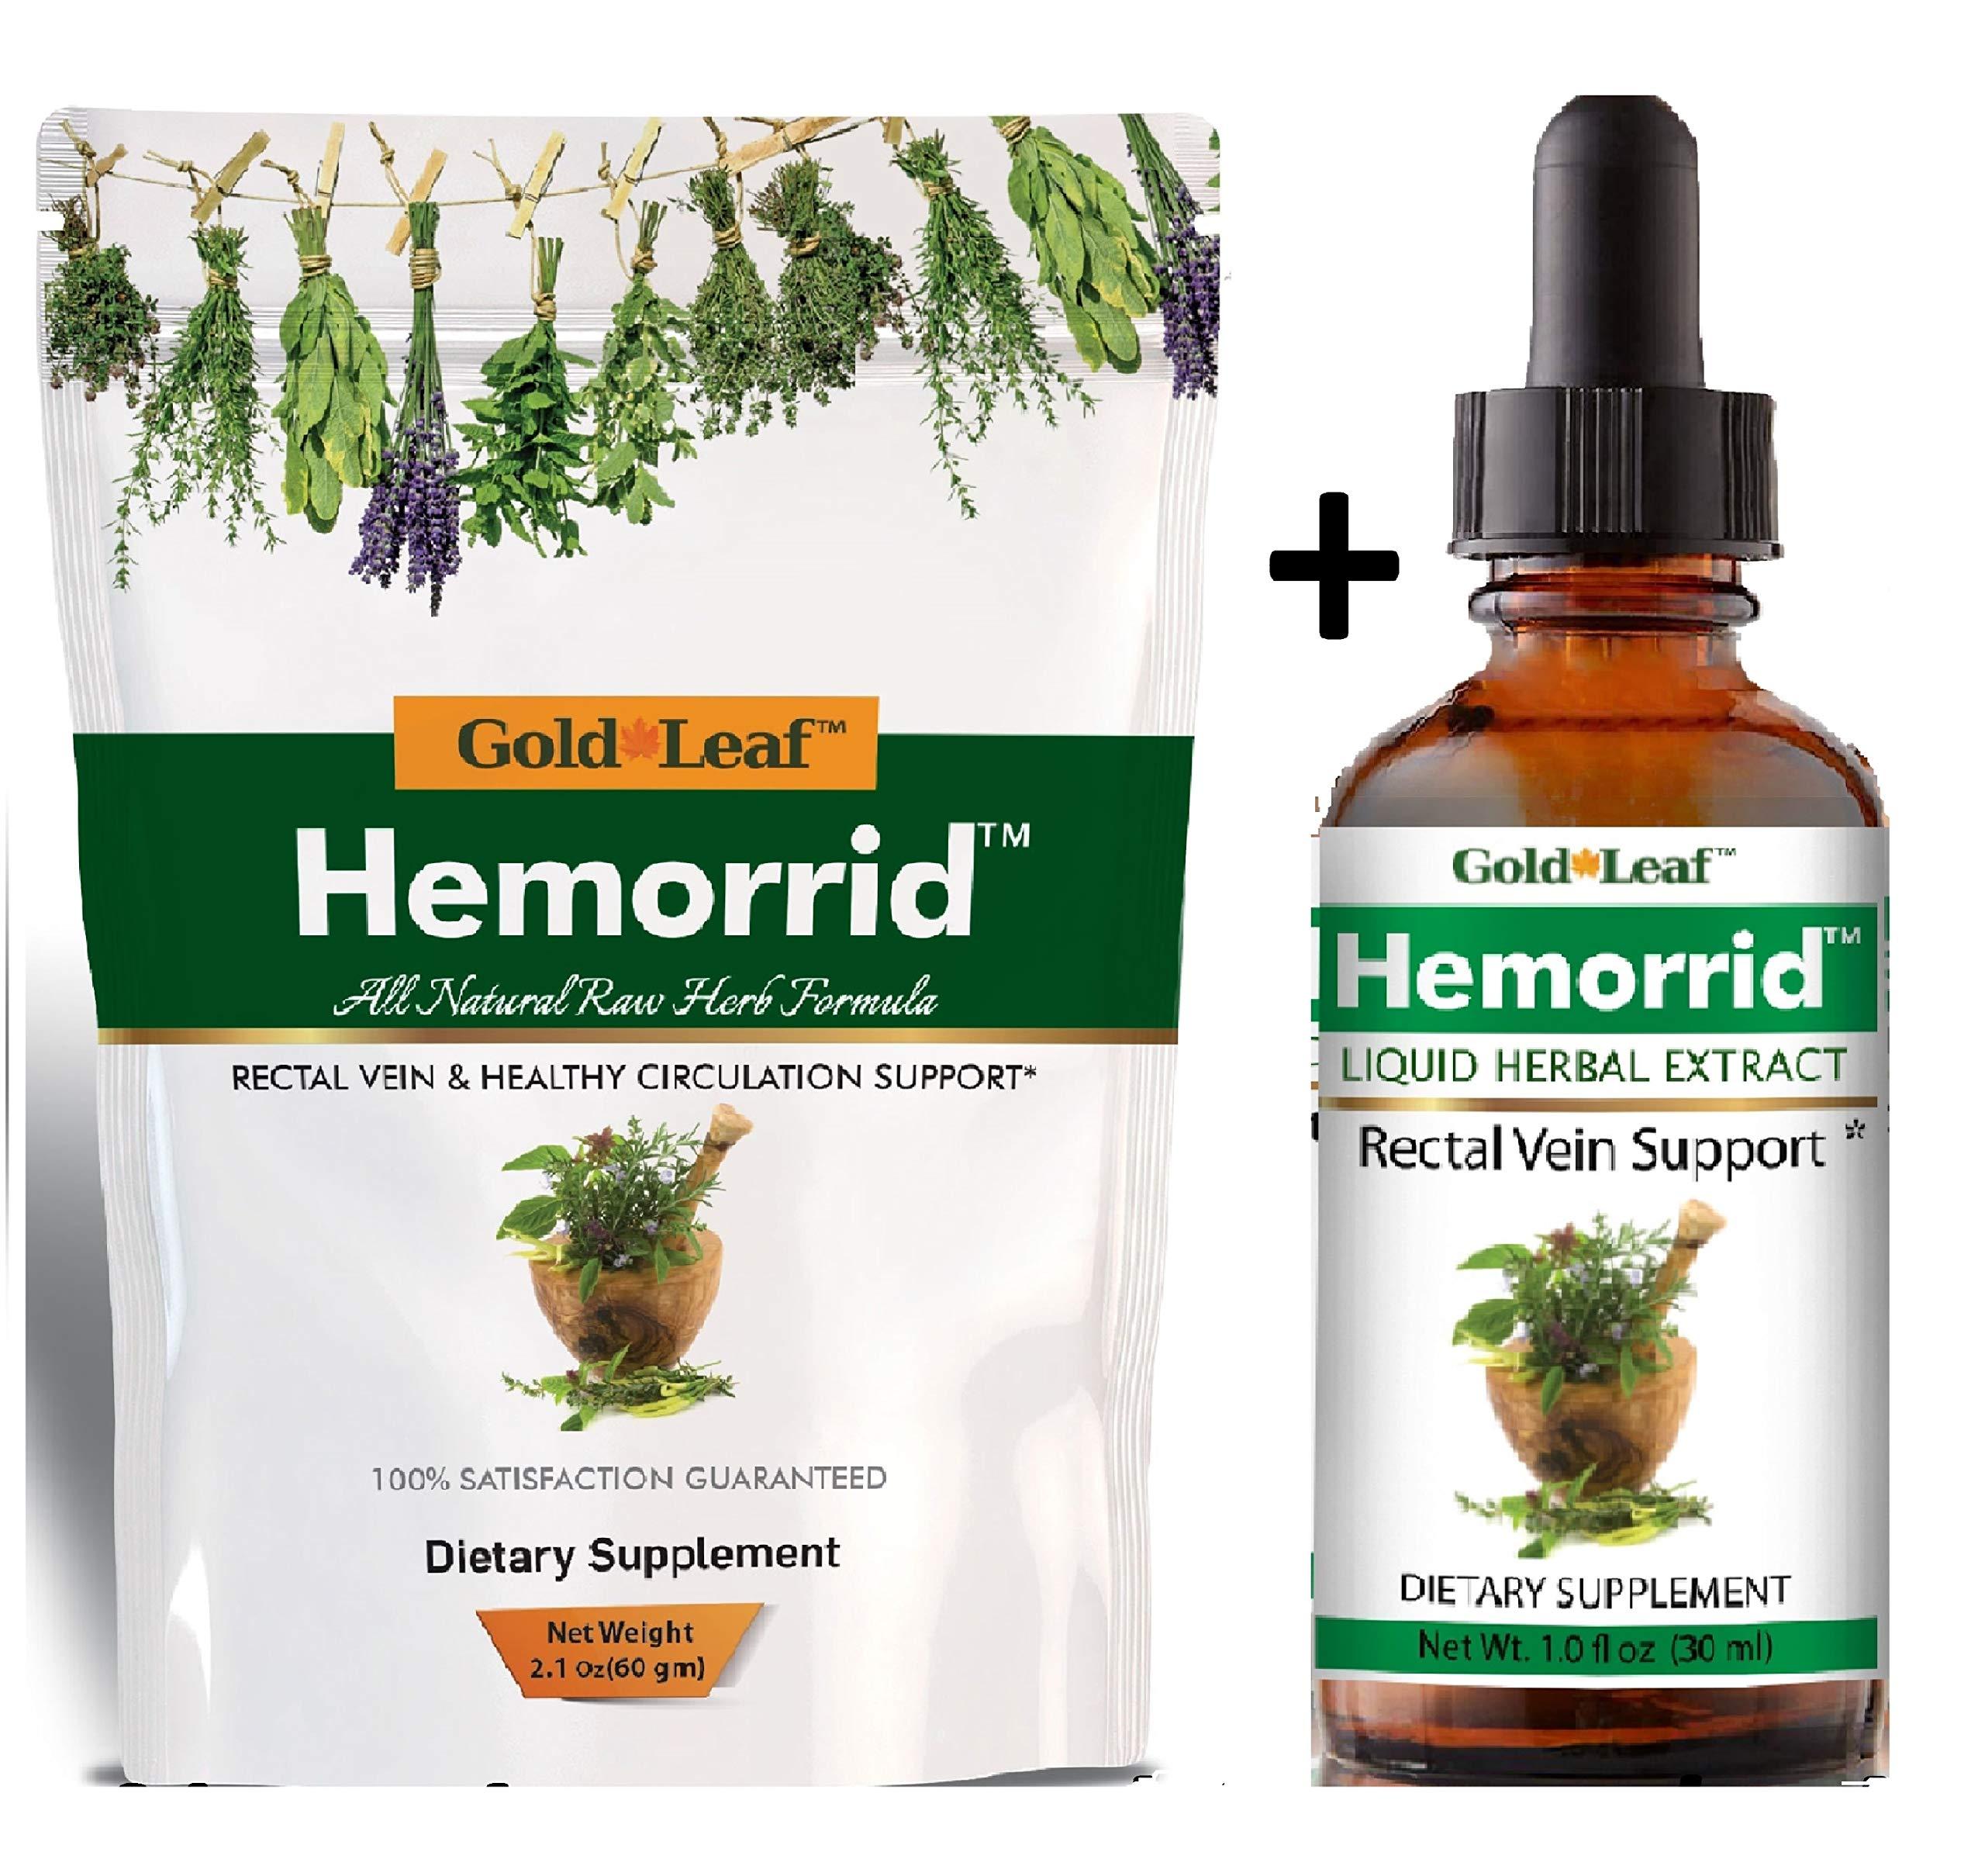 Hemorrhoid Treatment # 1 Fast Relief Formula for Hemorrhoids, Pain, itching, Bleeding, Non-Bleeding, fissures, Internal & External Hemorrhoids. by Gold Leaf Herbs